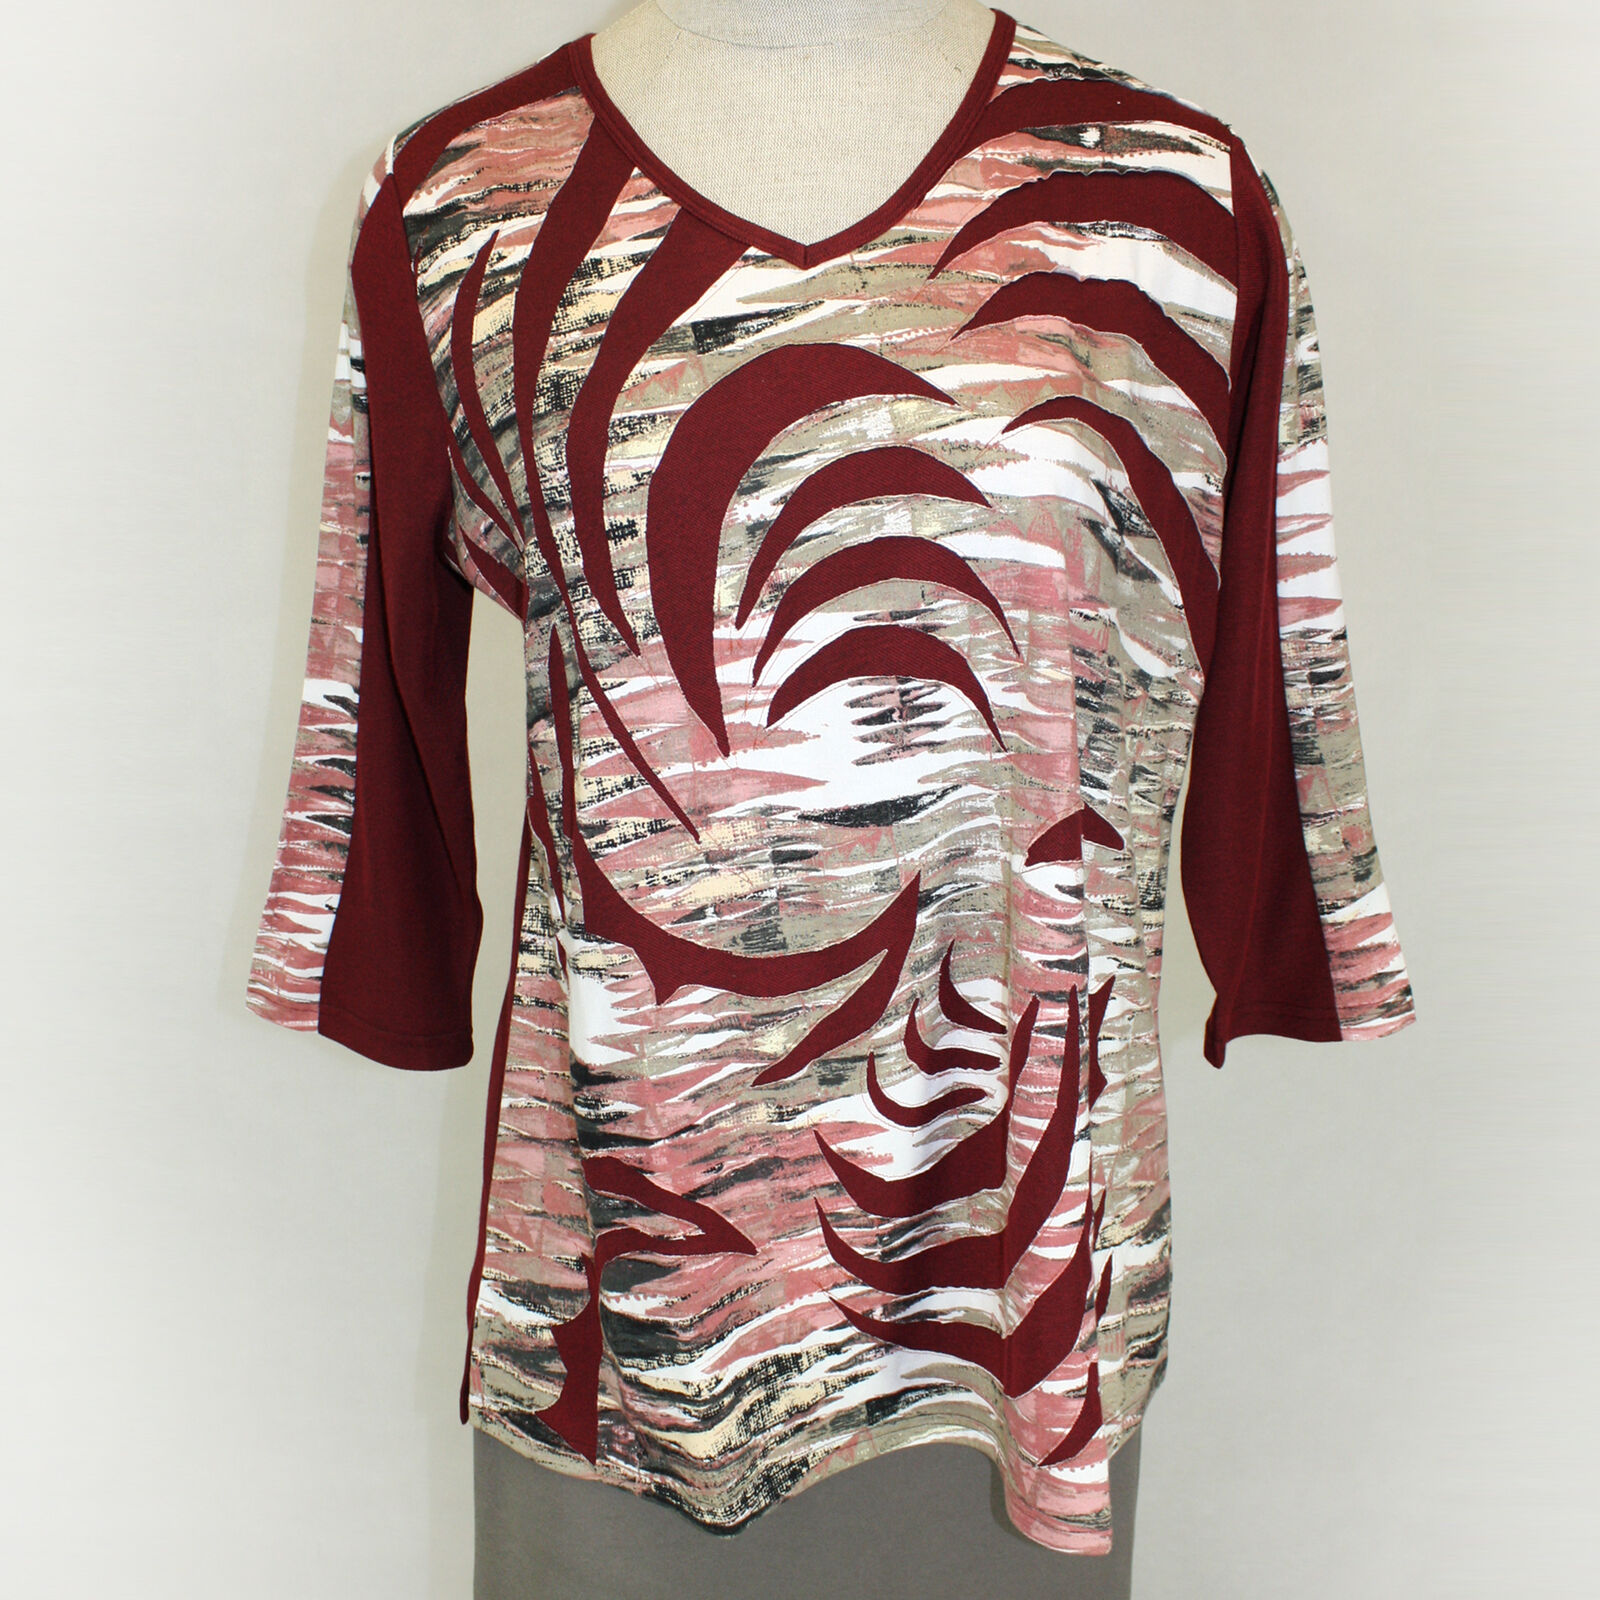 NEW Parsley & Sage Plus Größe rot Cutwork Tunic V-Neck Top Blouse 1X